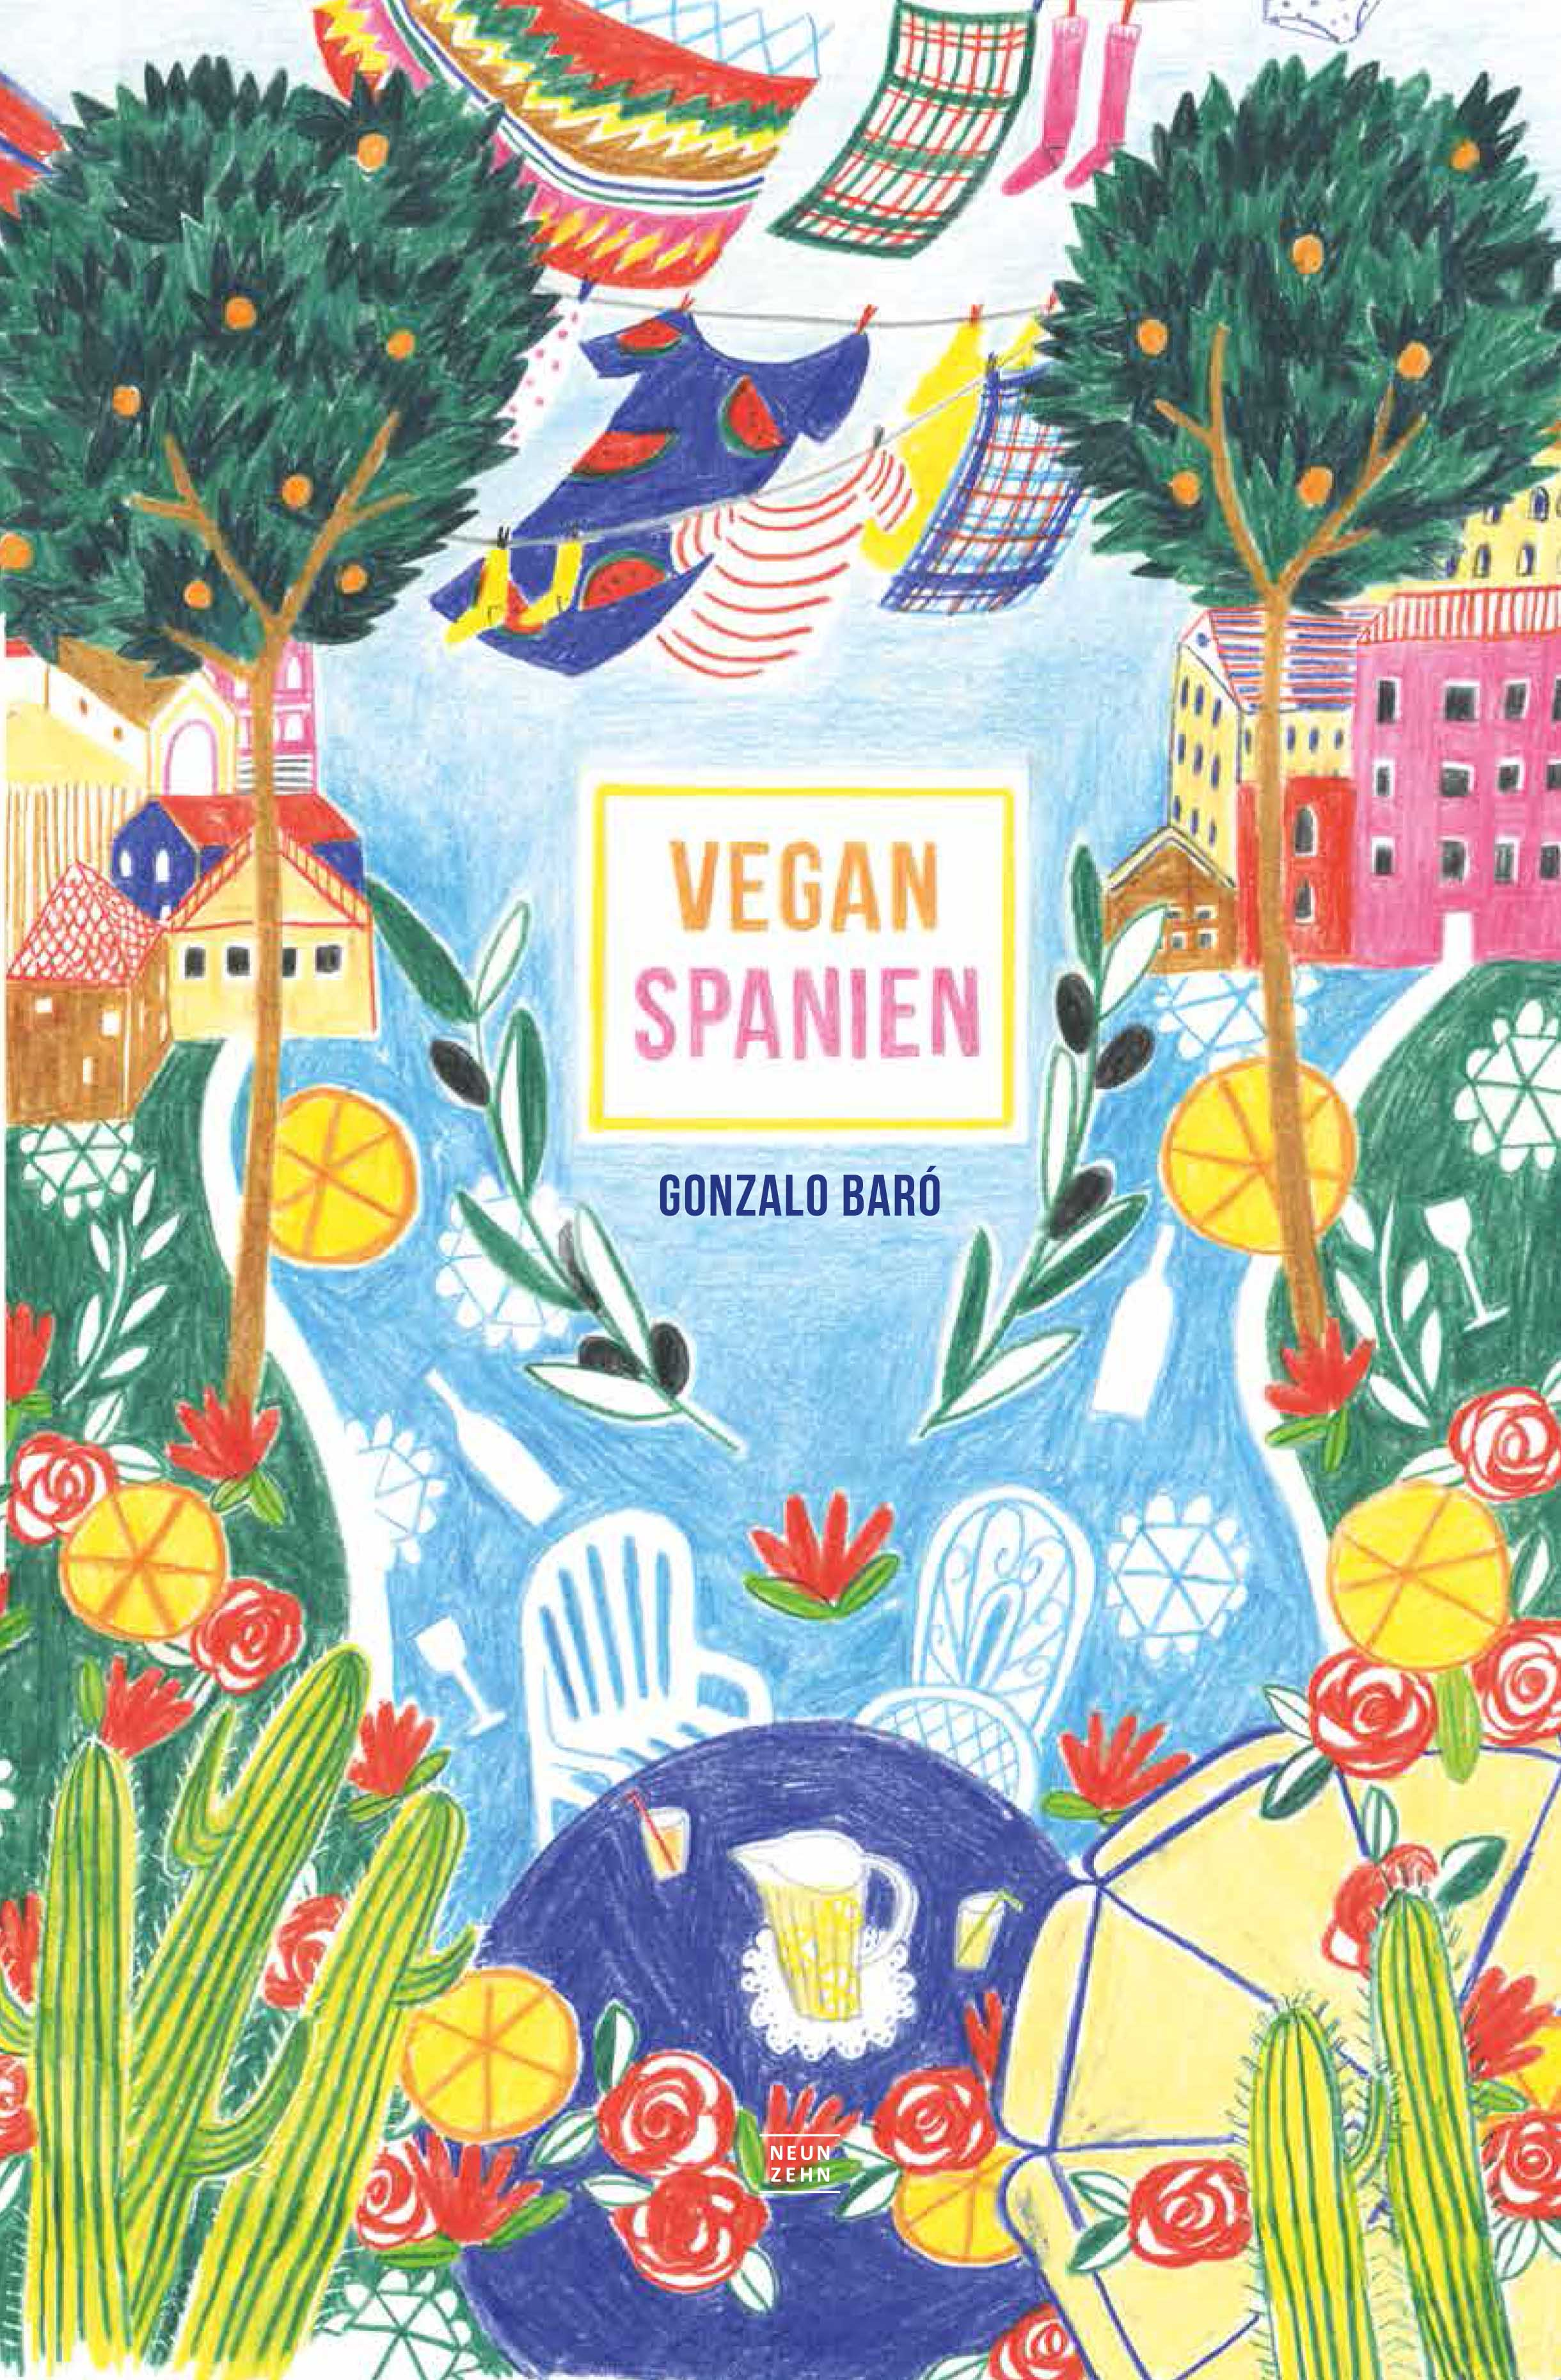 vegan-spanien-cover-preview.jpg